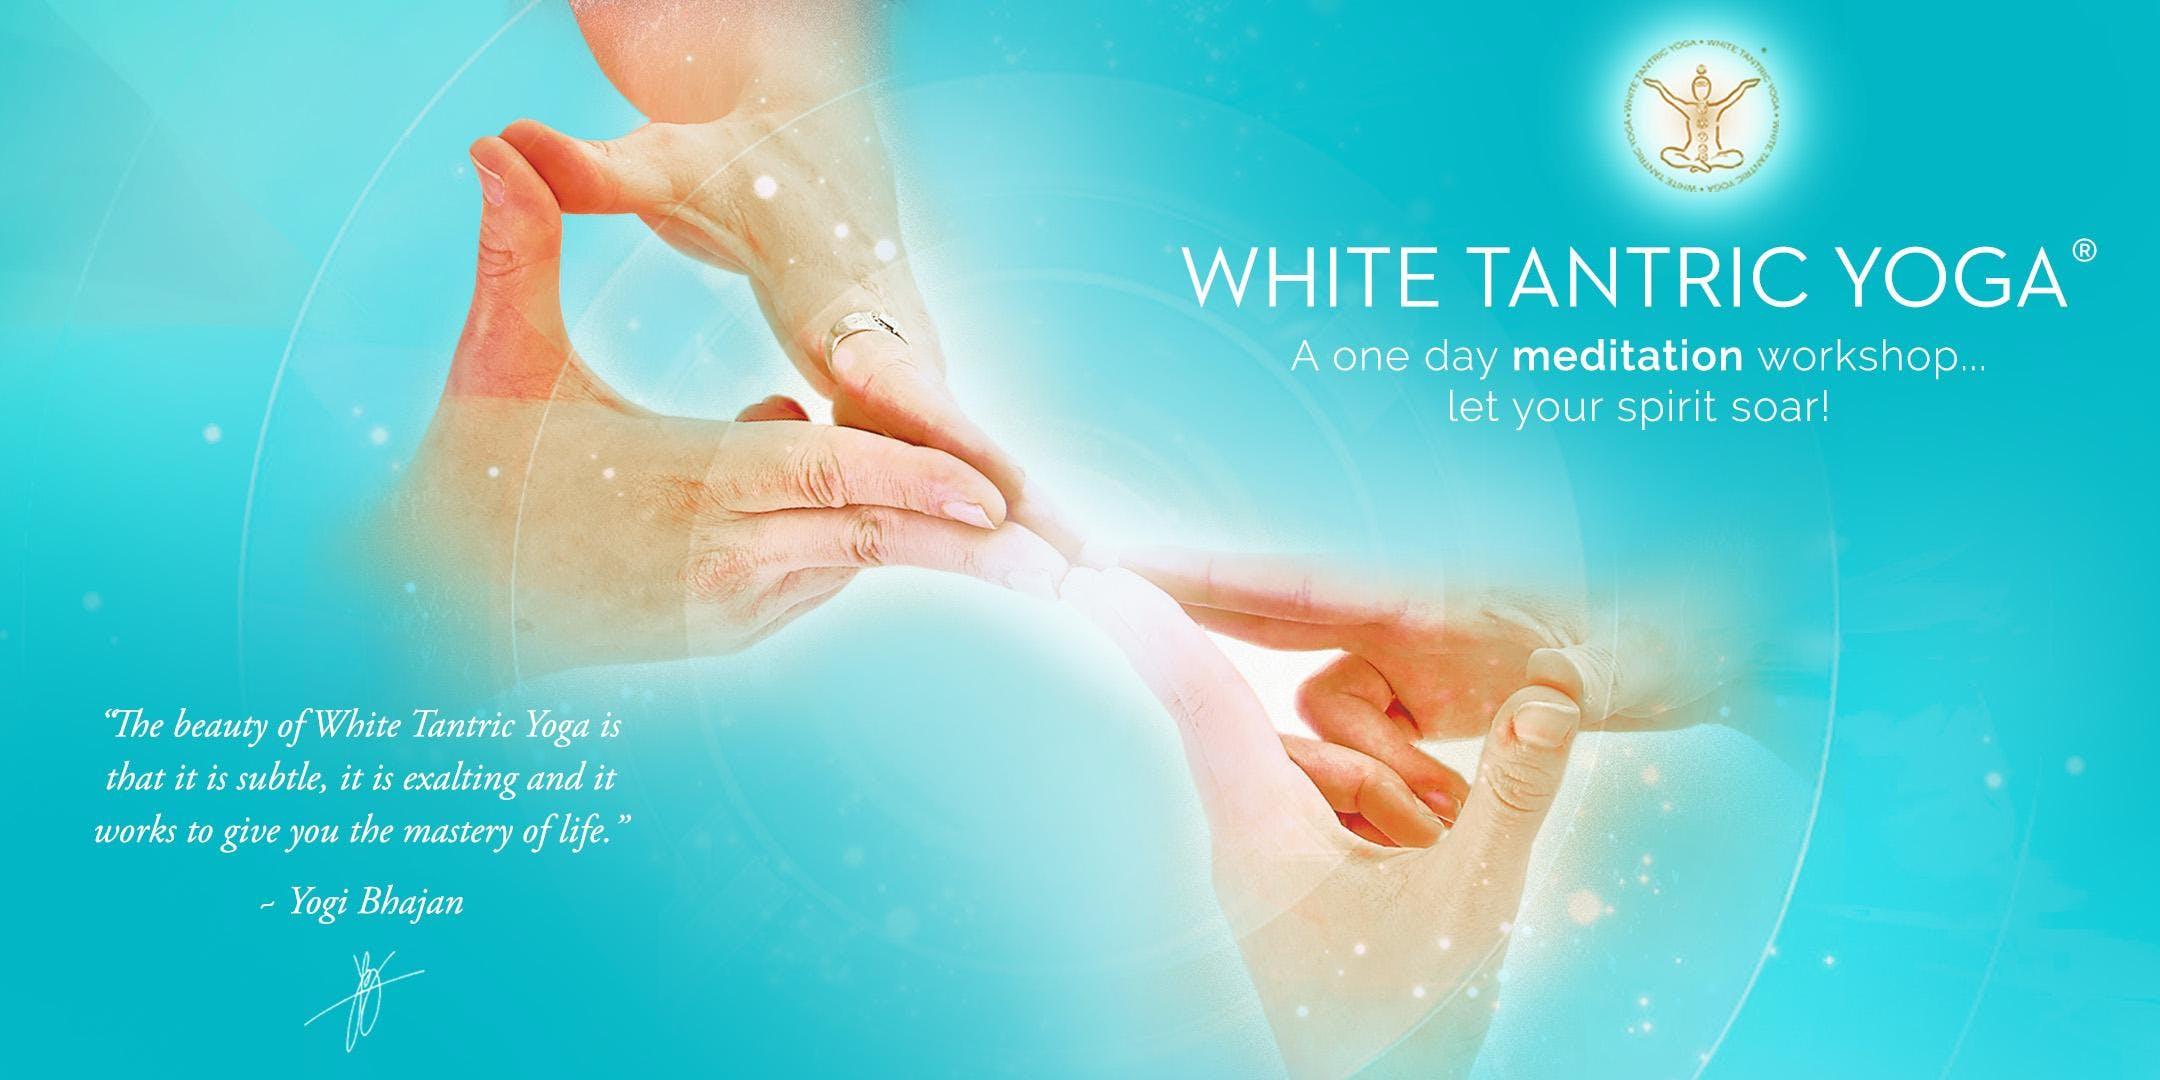 White Tantric Yoga® Los Angeles, CA